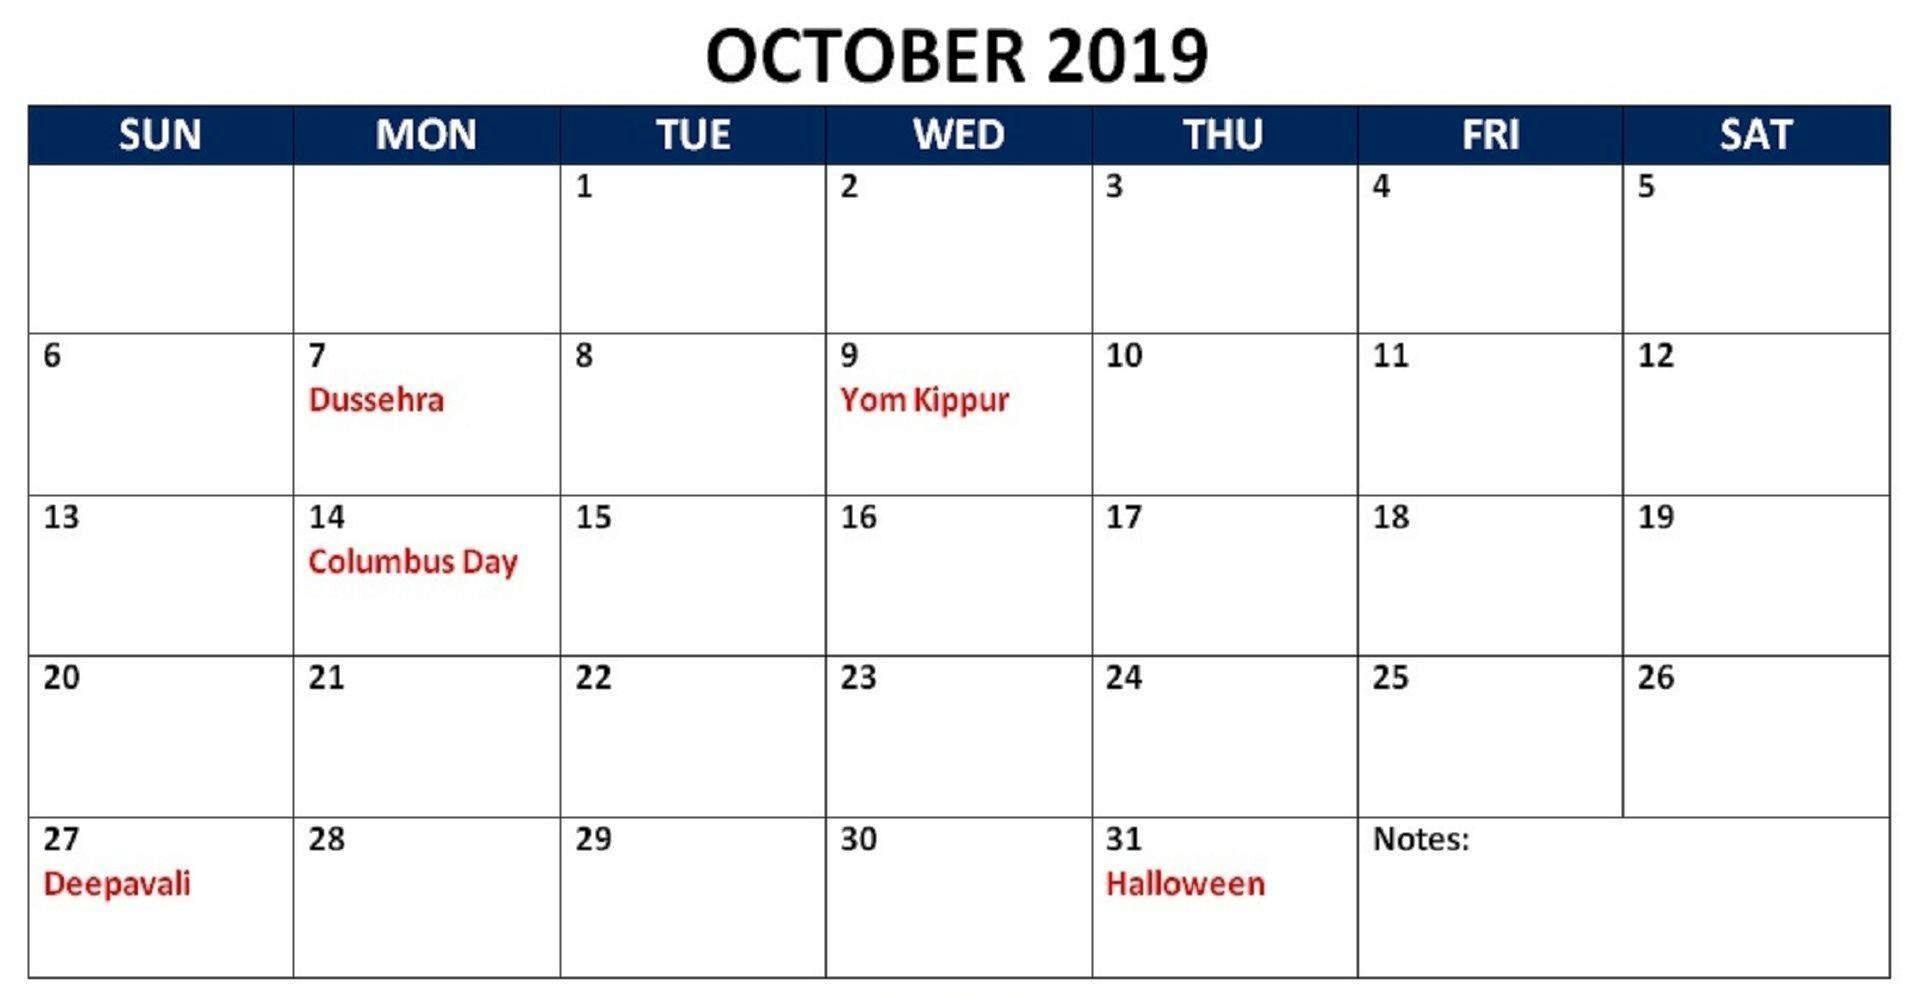 October 2019 Calendar with Holidays